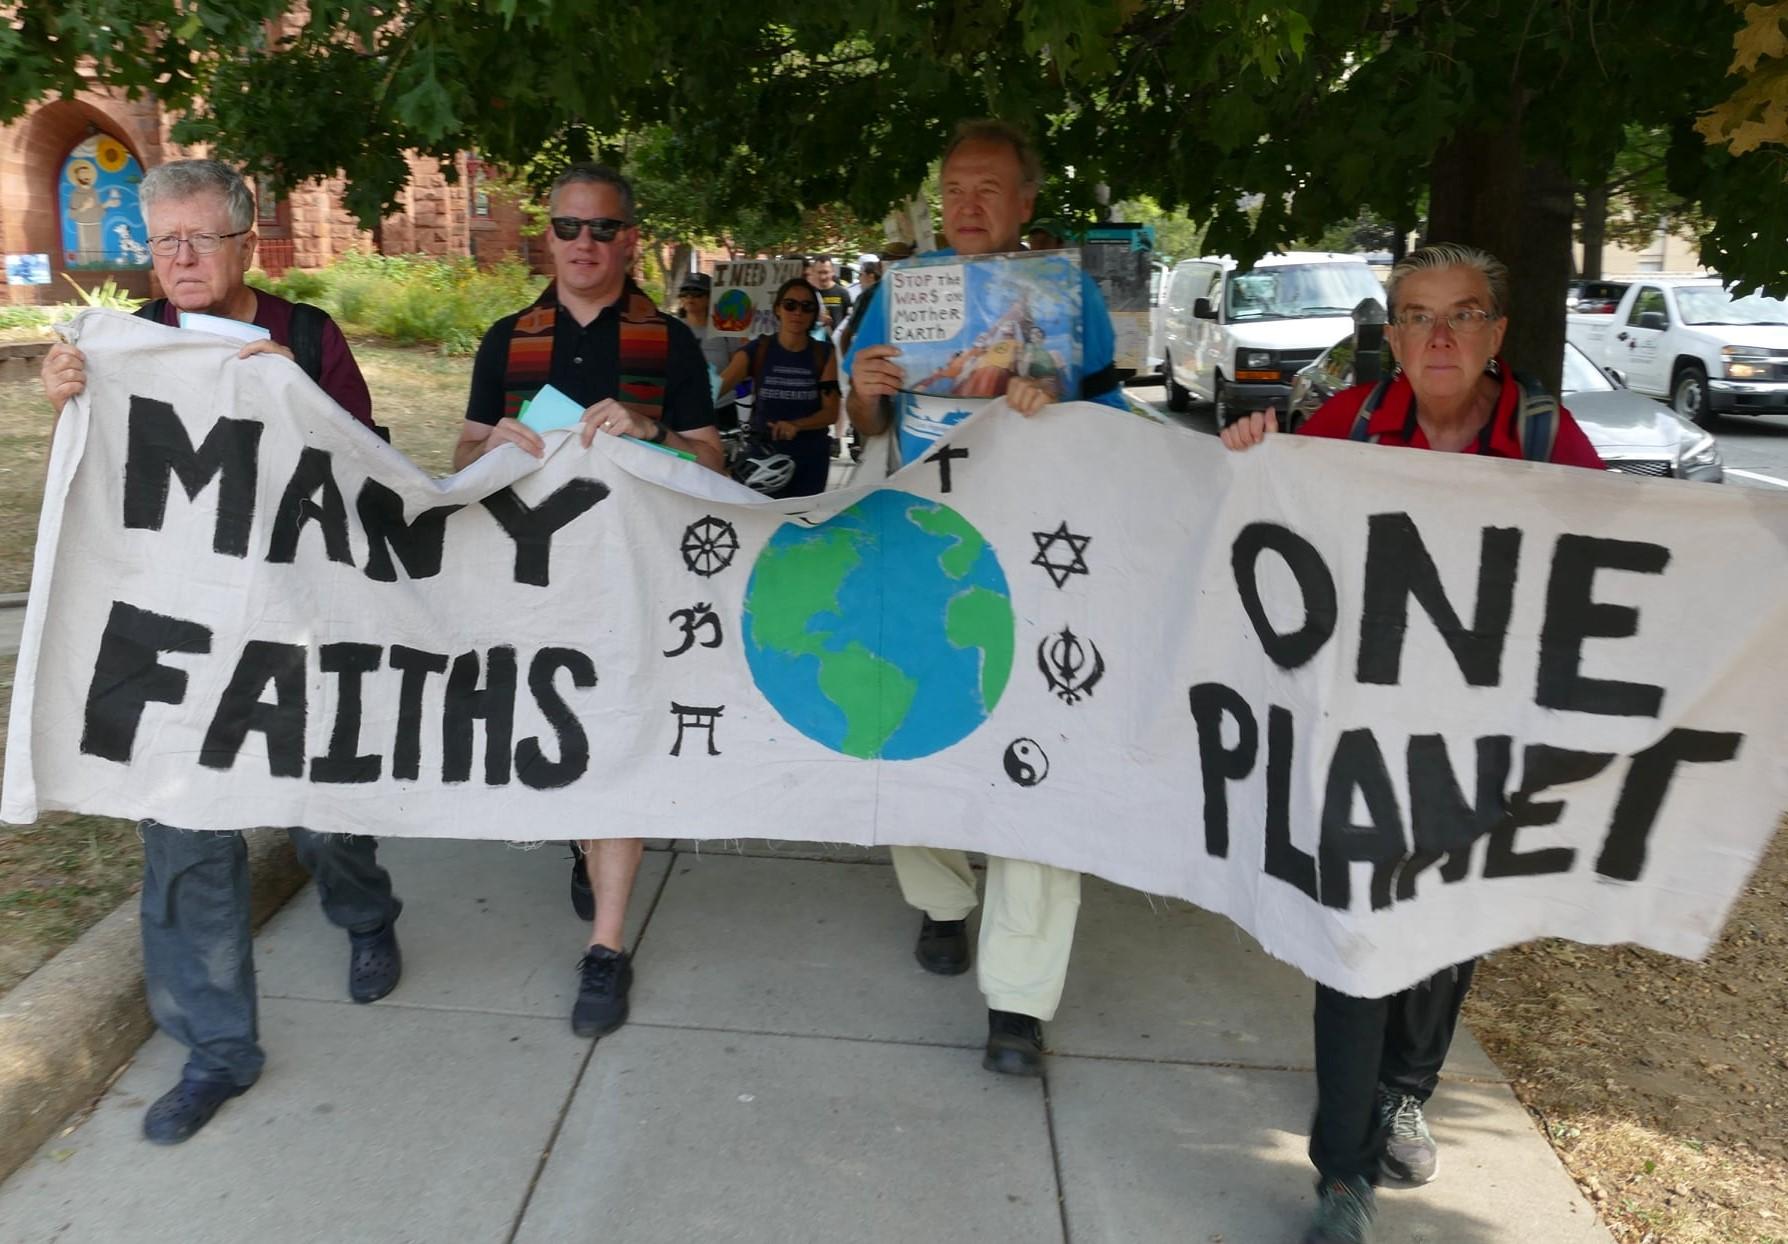 Religious procession, DC, 9/23/19